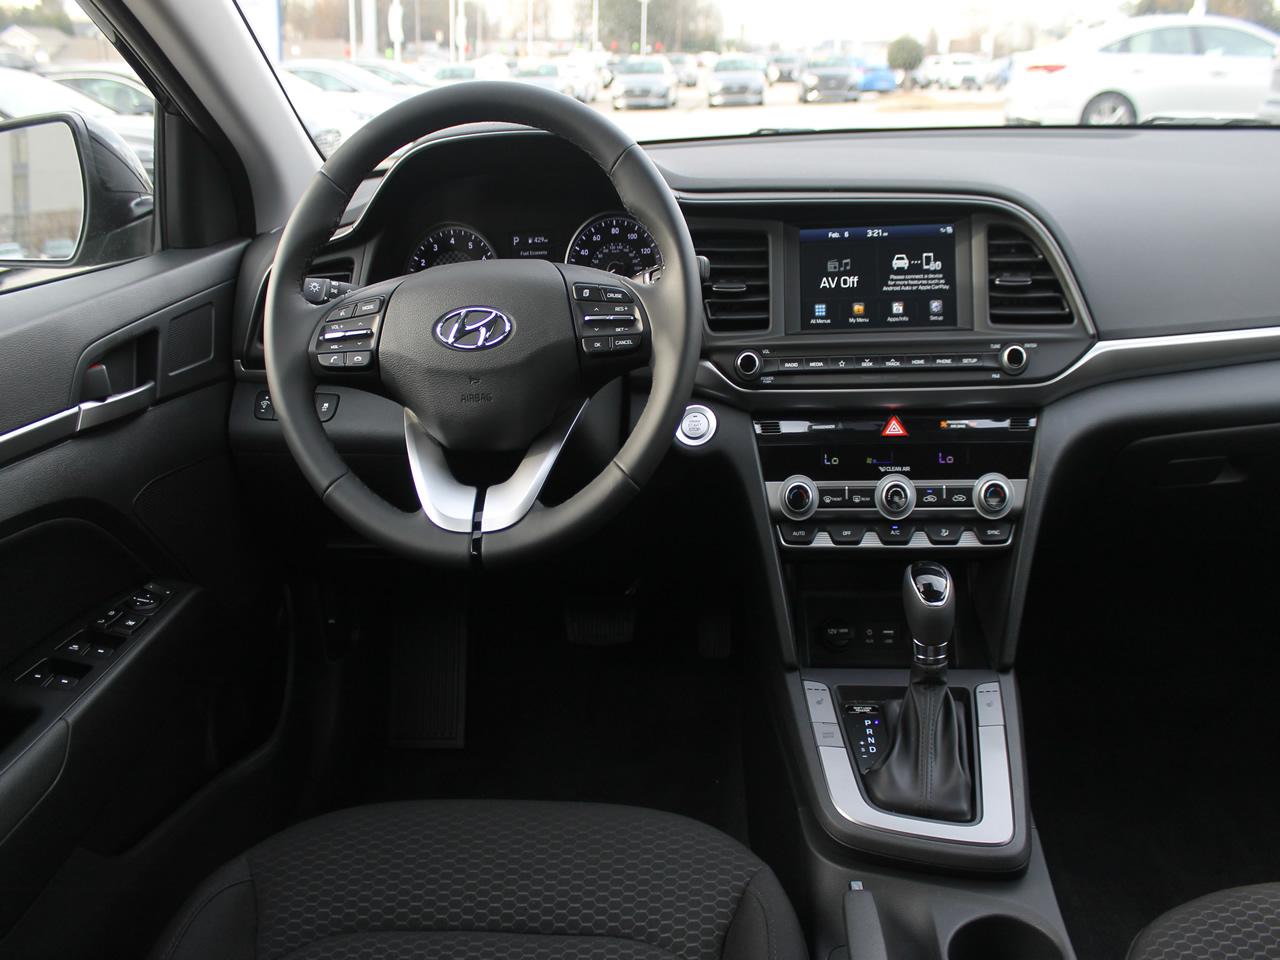 Dick Smith Hyundai >> NEW 2019 HYUNDAI ELANTRA VALUE EDITION VIN 5NPD84LF1KH422754 - Hyundai in Greenville | Hyundai ...